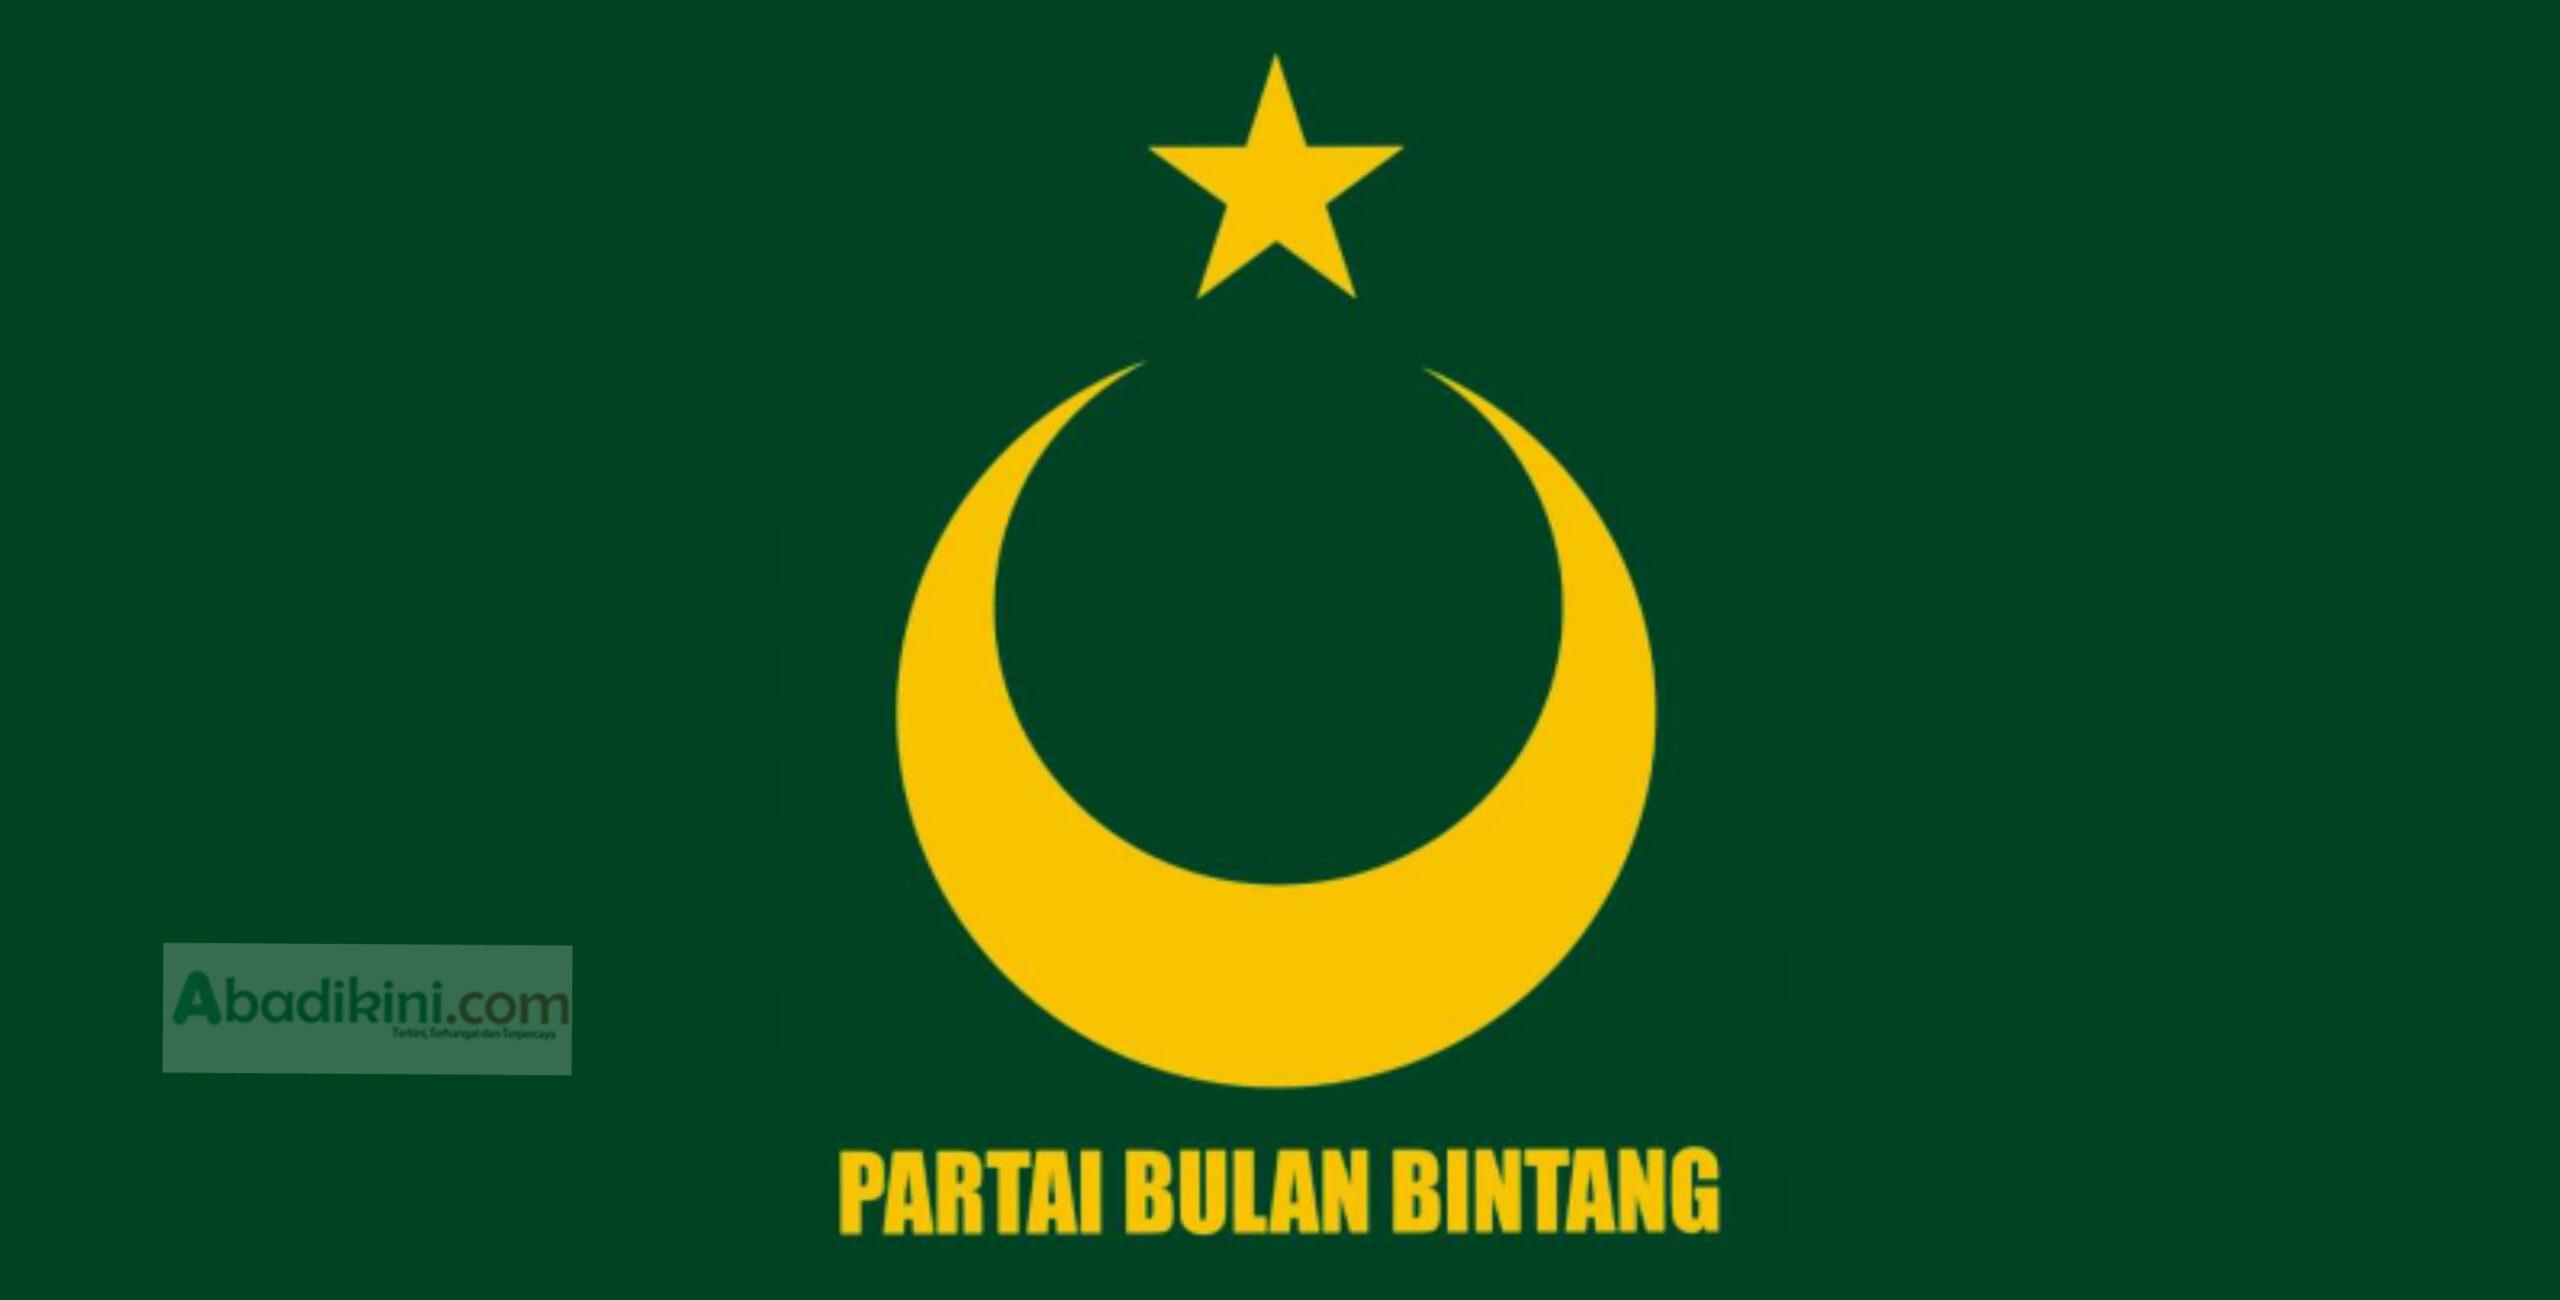 Partai Bulan Bintang Akan Luncurkan KTA Online - Laman 2 ...